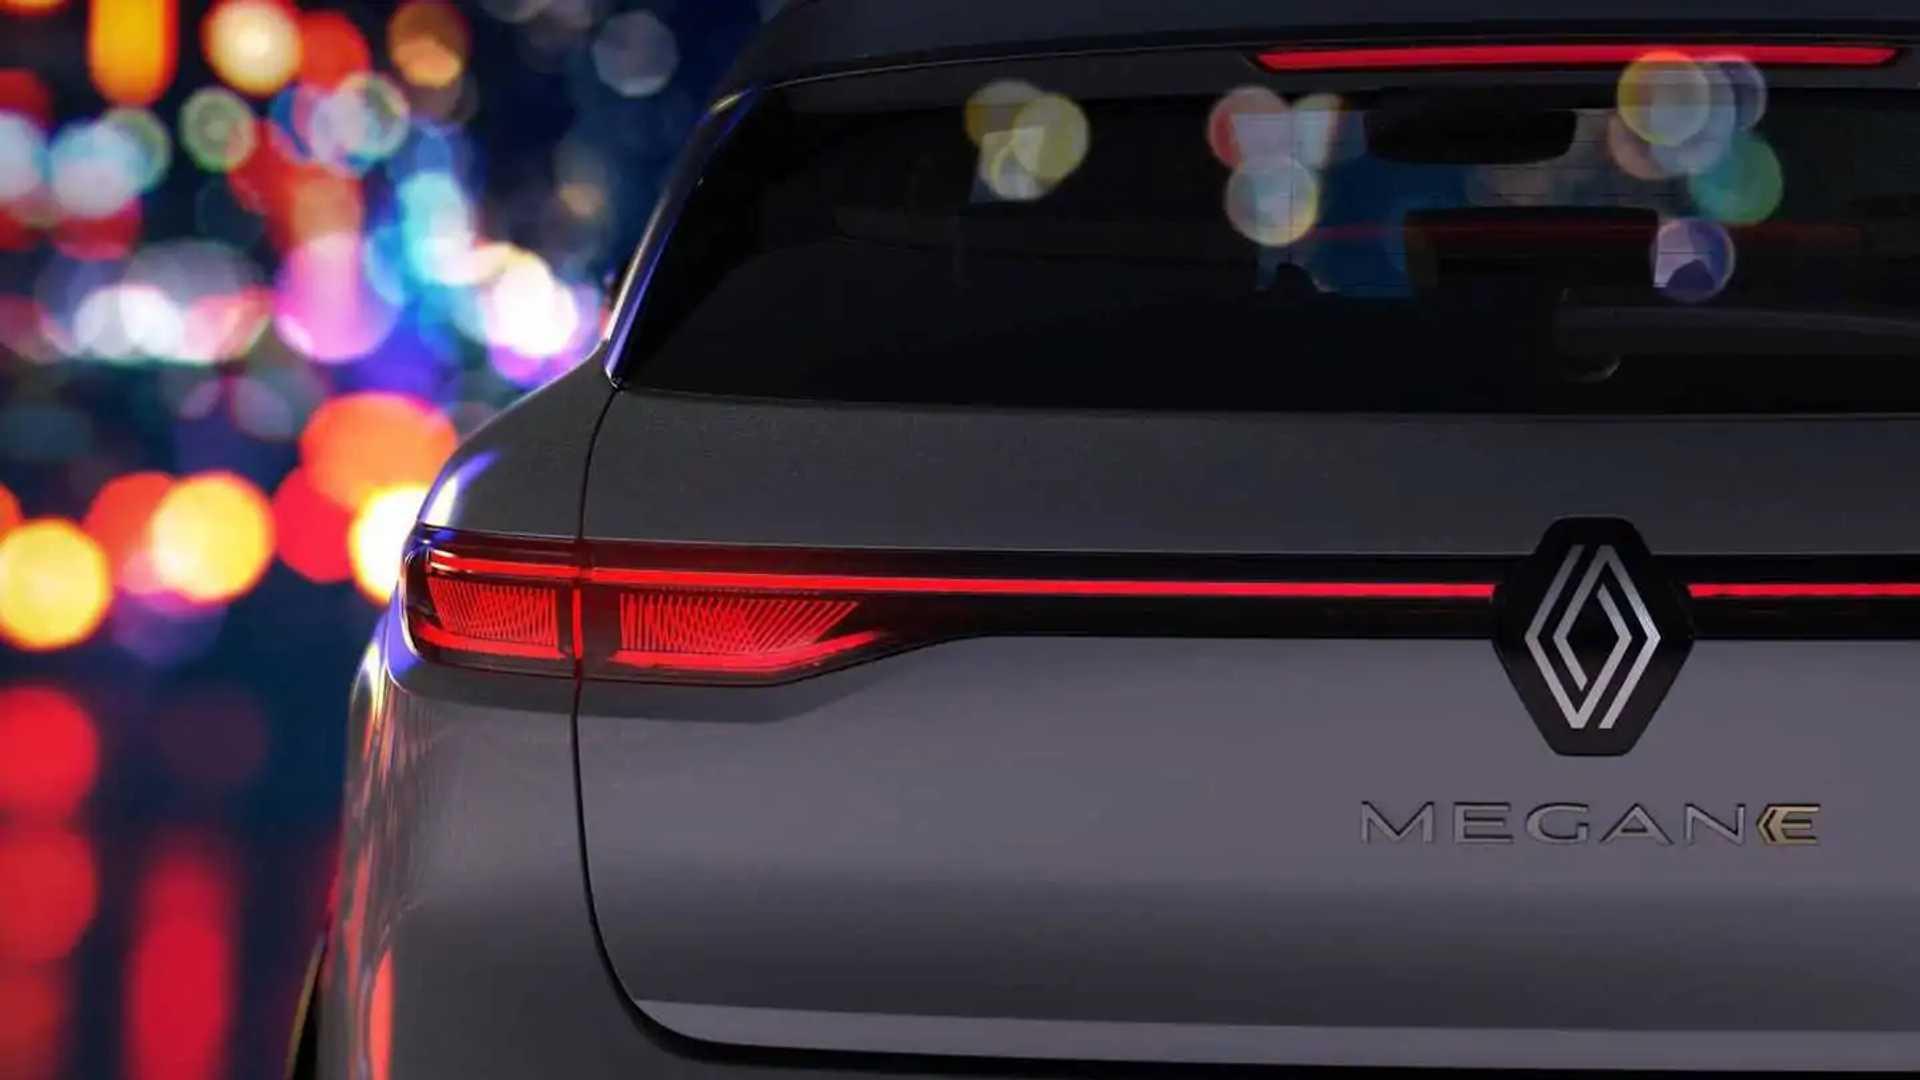 Renault Megane E-Tech elétrico - teasers